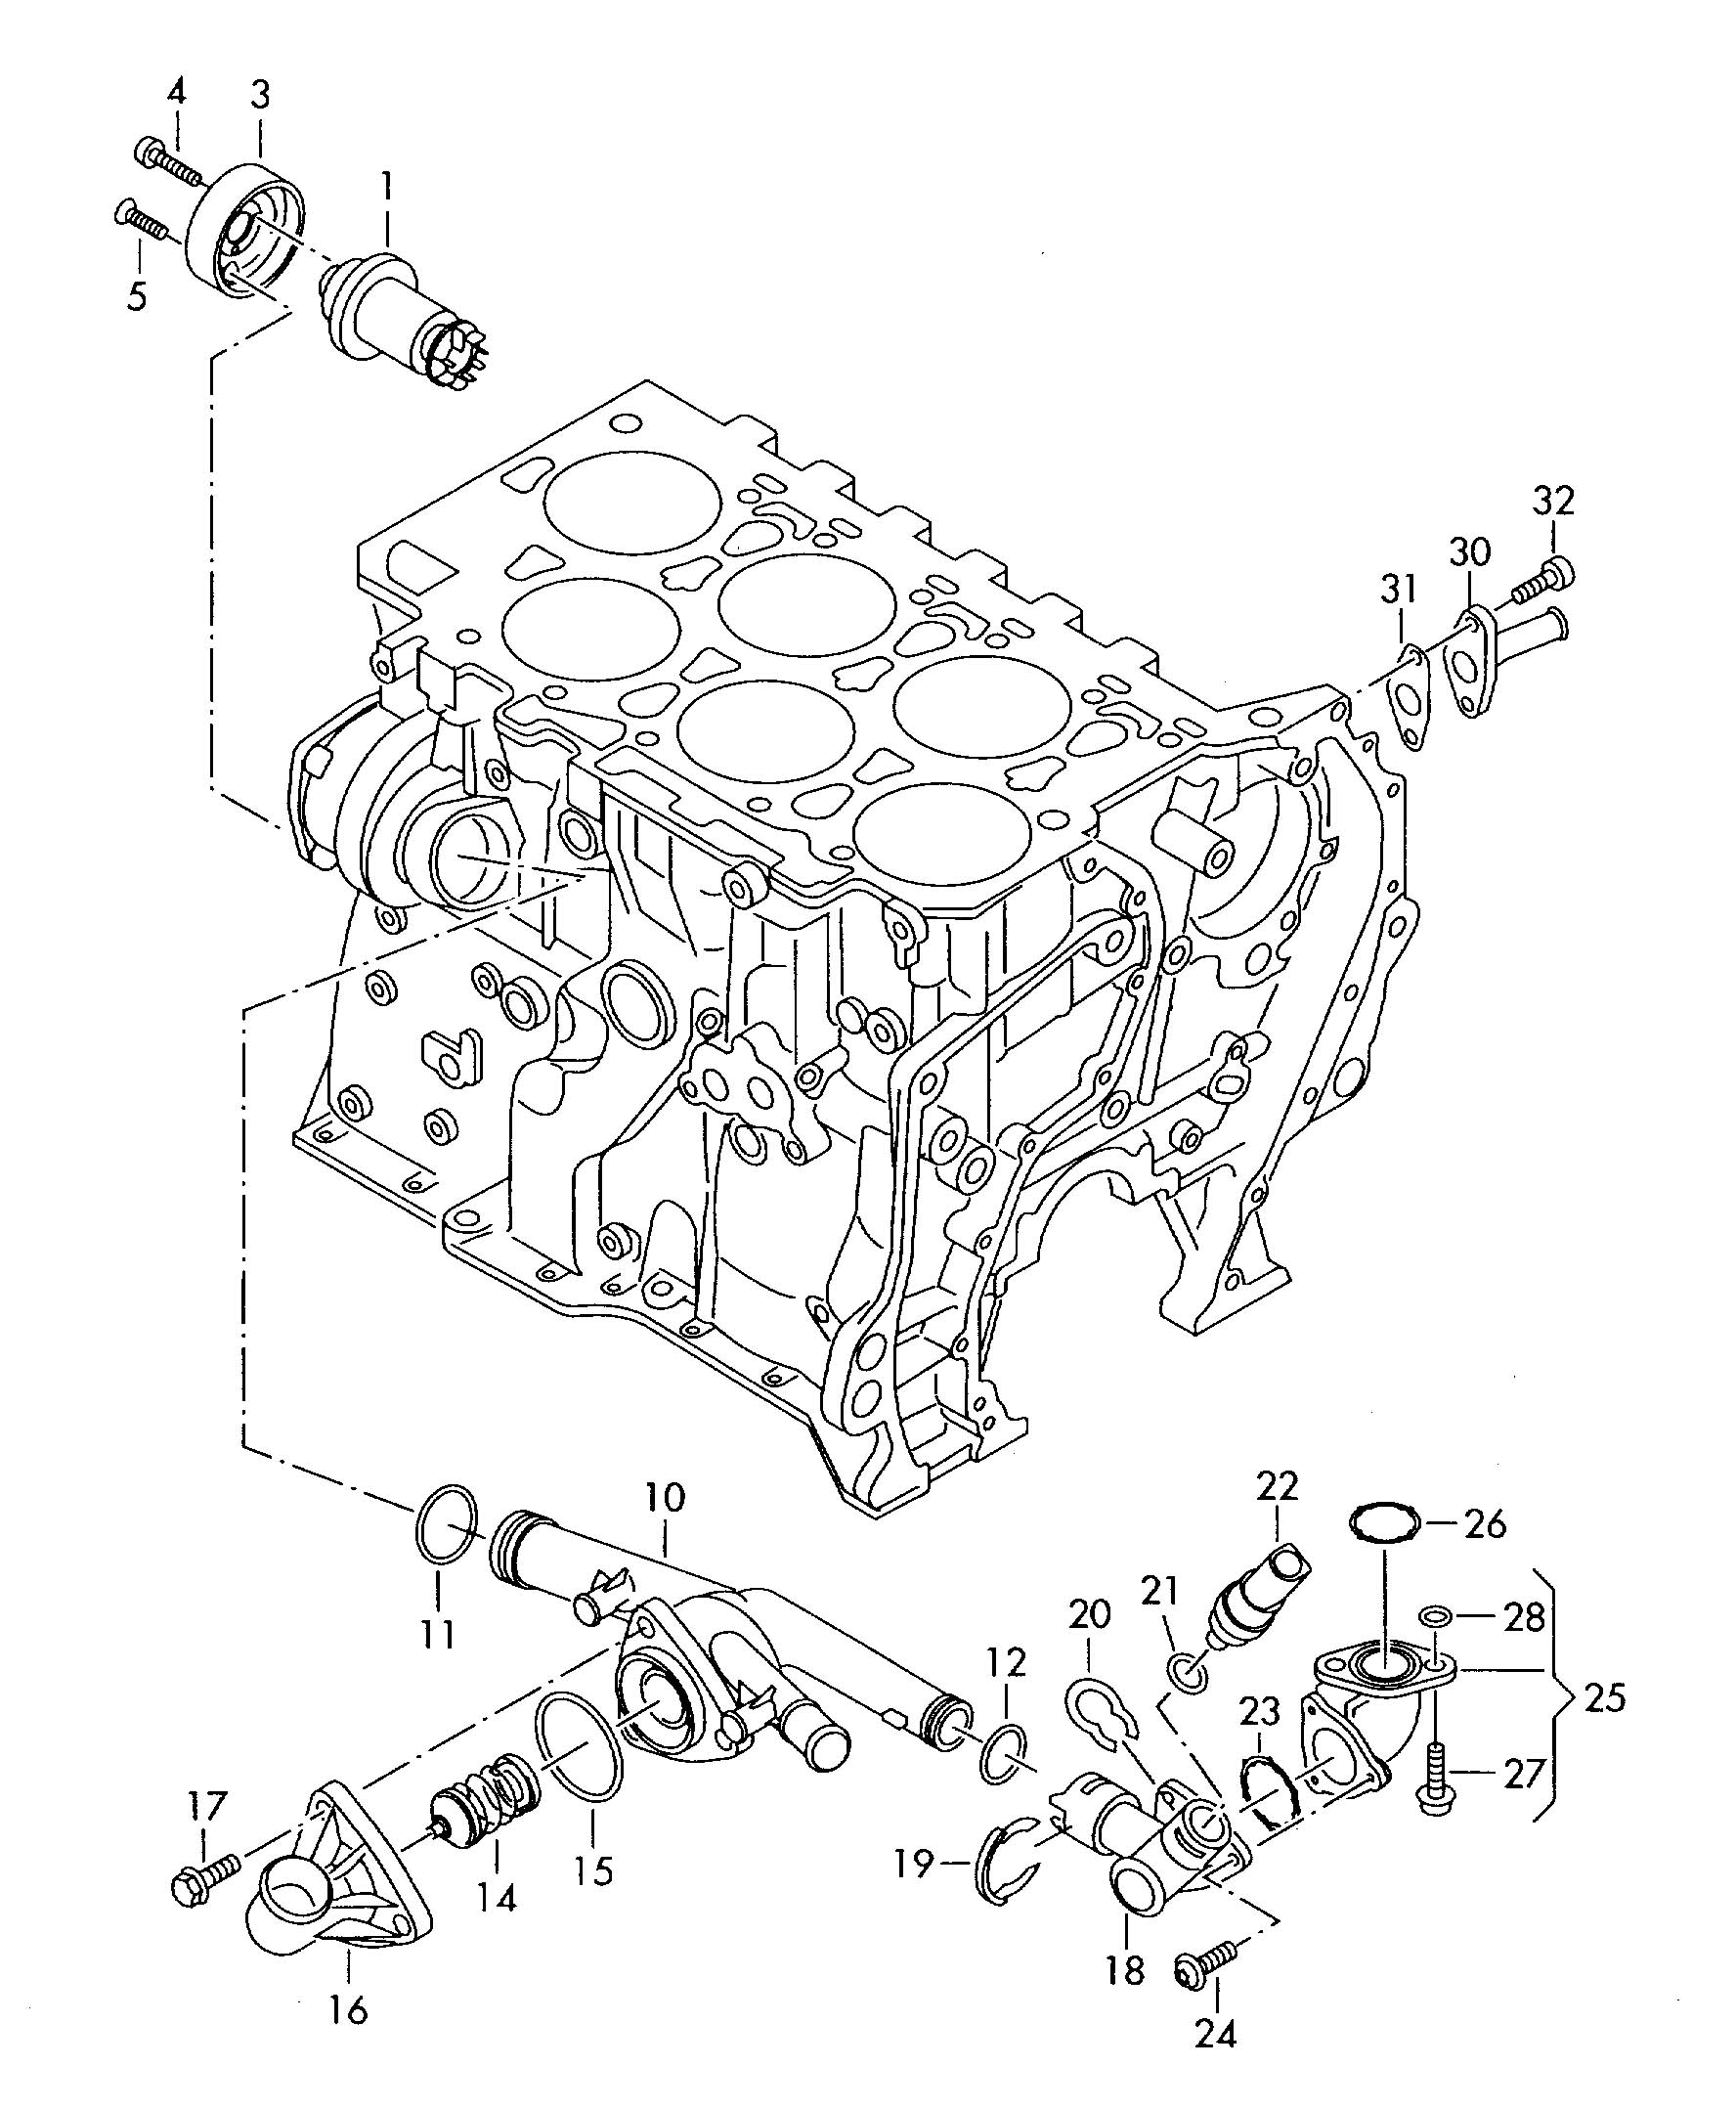 Volkswagen Vw Passat Water Pump Thermostat 3 6ltr